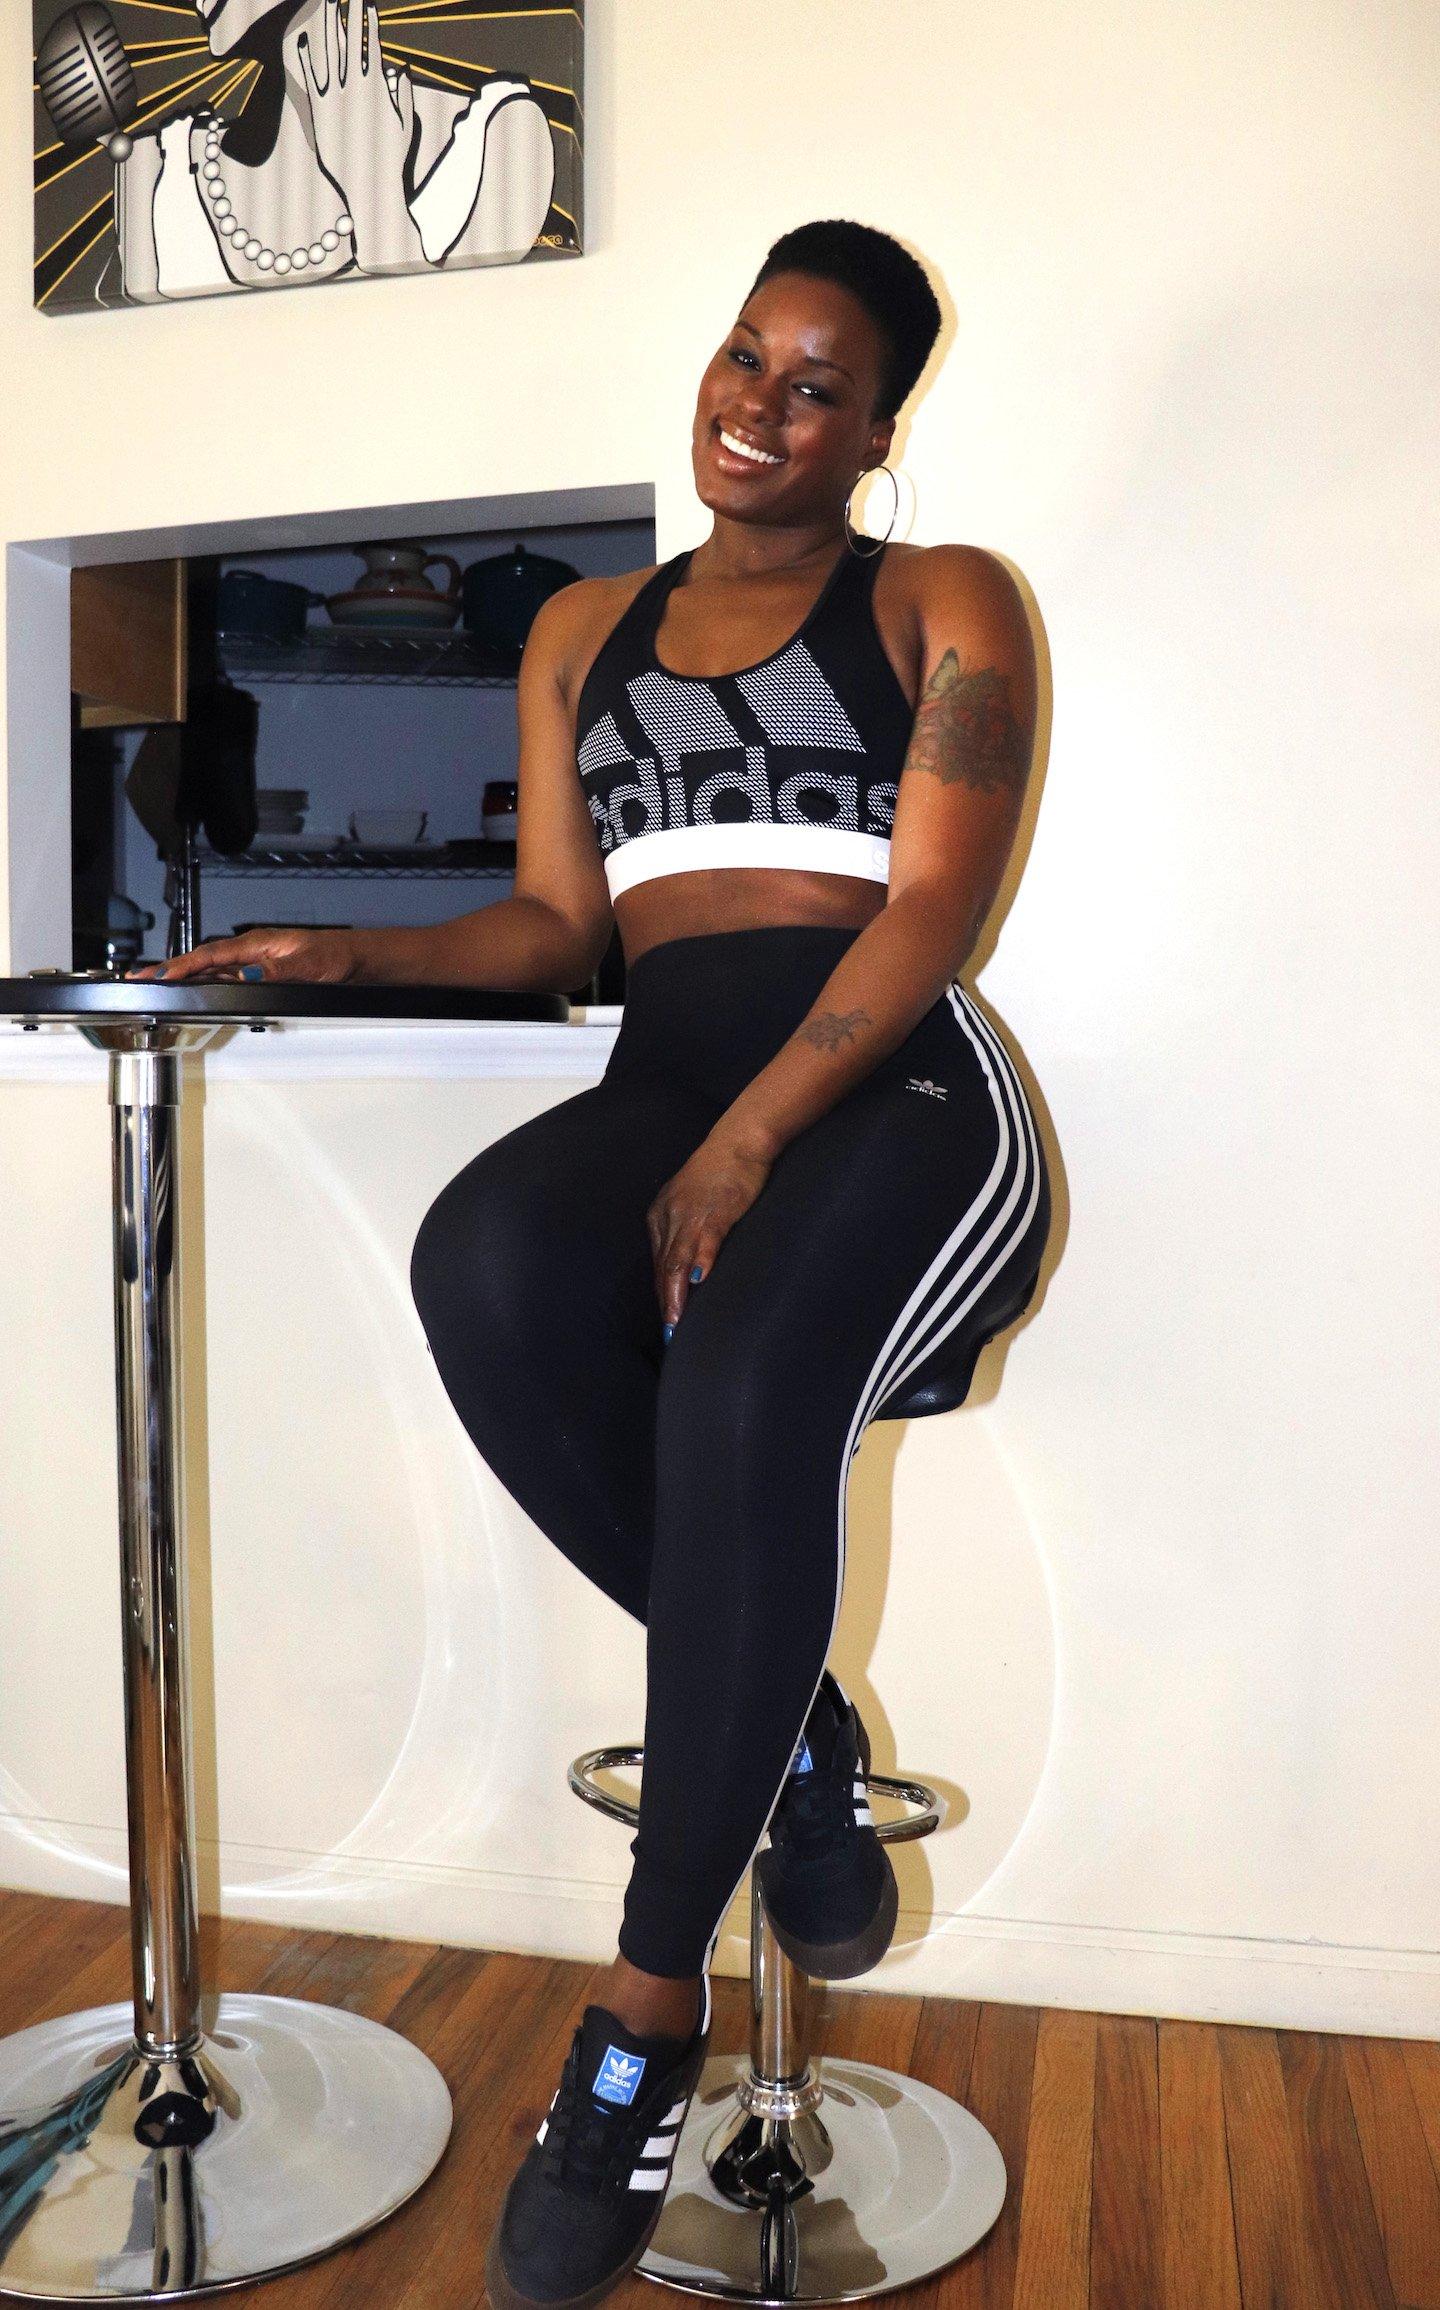 adidas Don't Rest Alphaskin Bra paired with 3 Stripe Leggings and Samba Rose Kicks